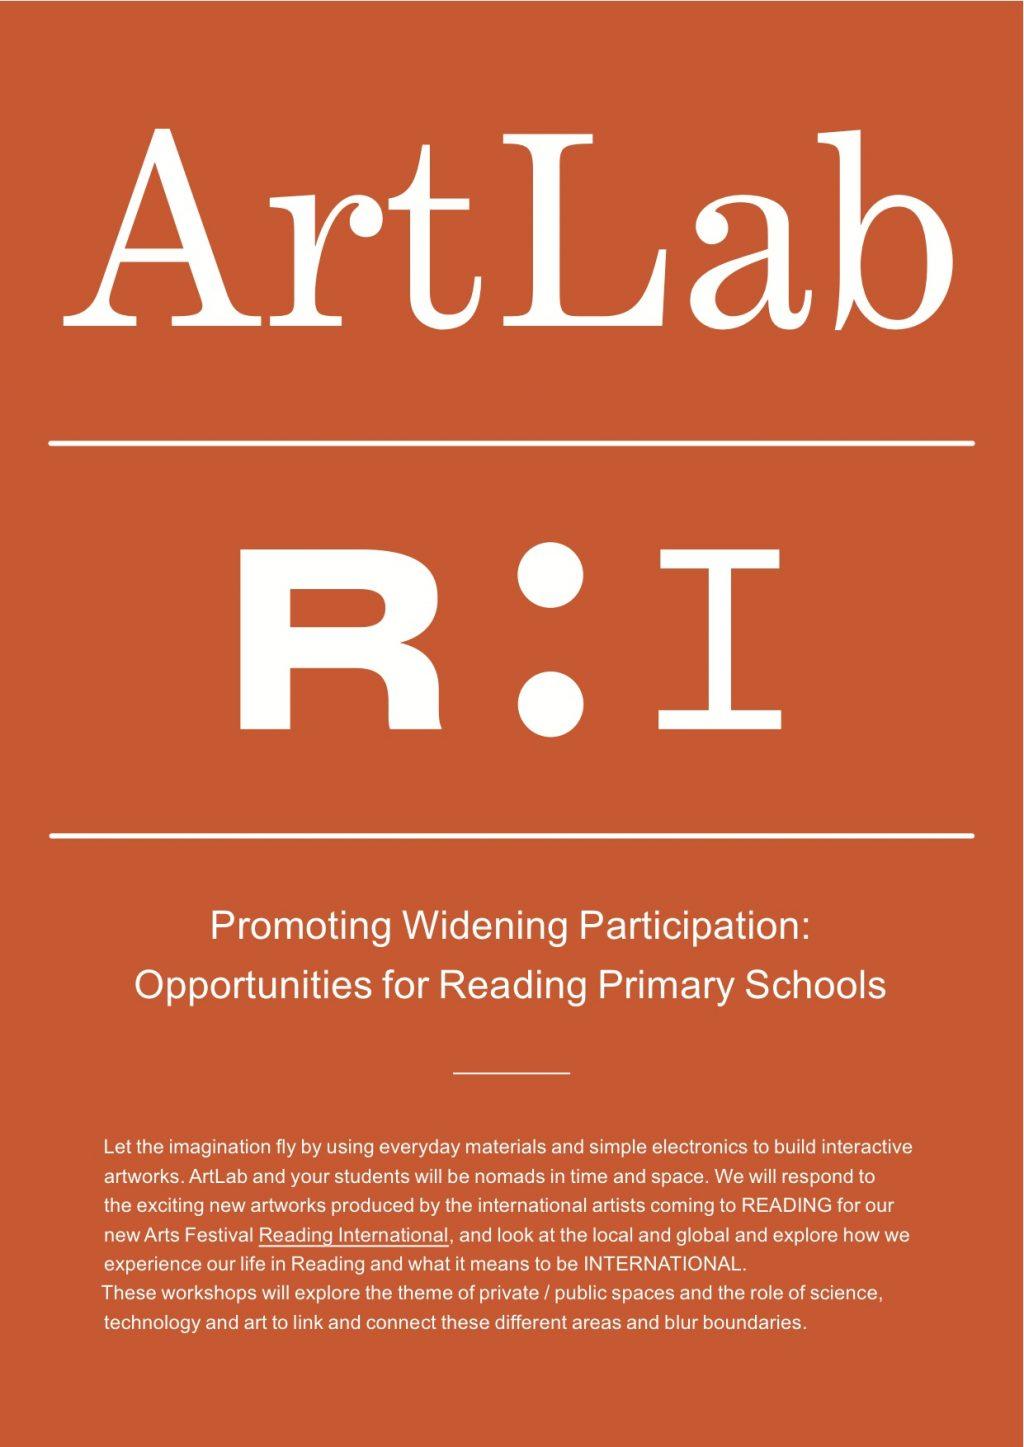 ArtLab summer WP-page01